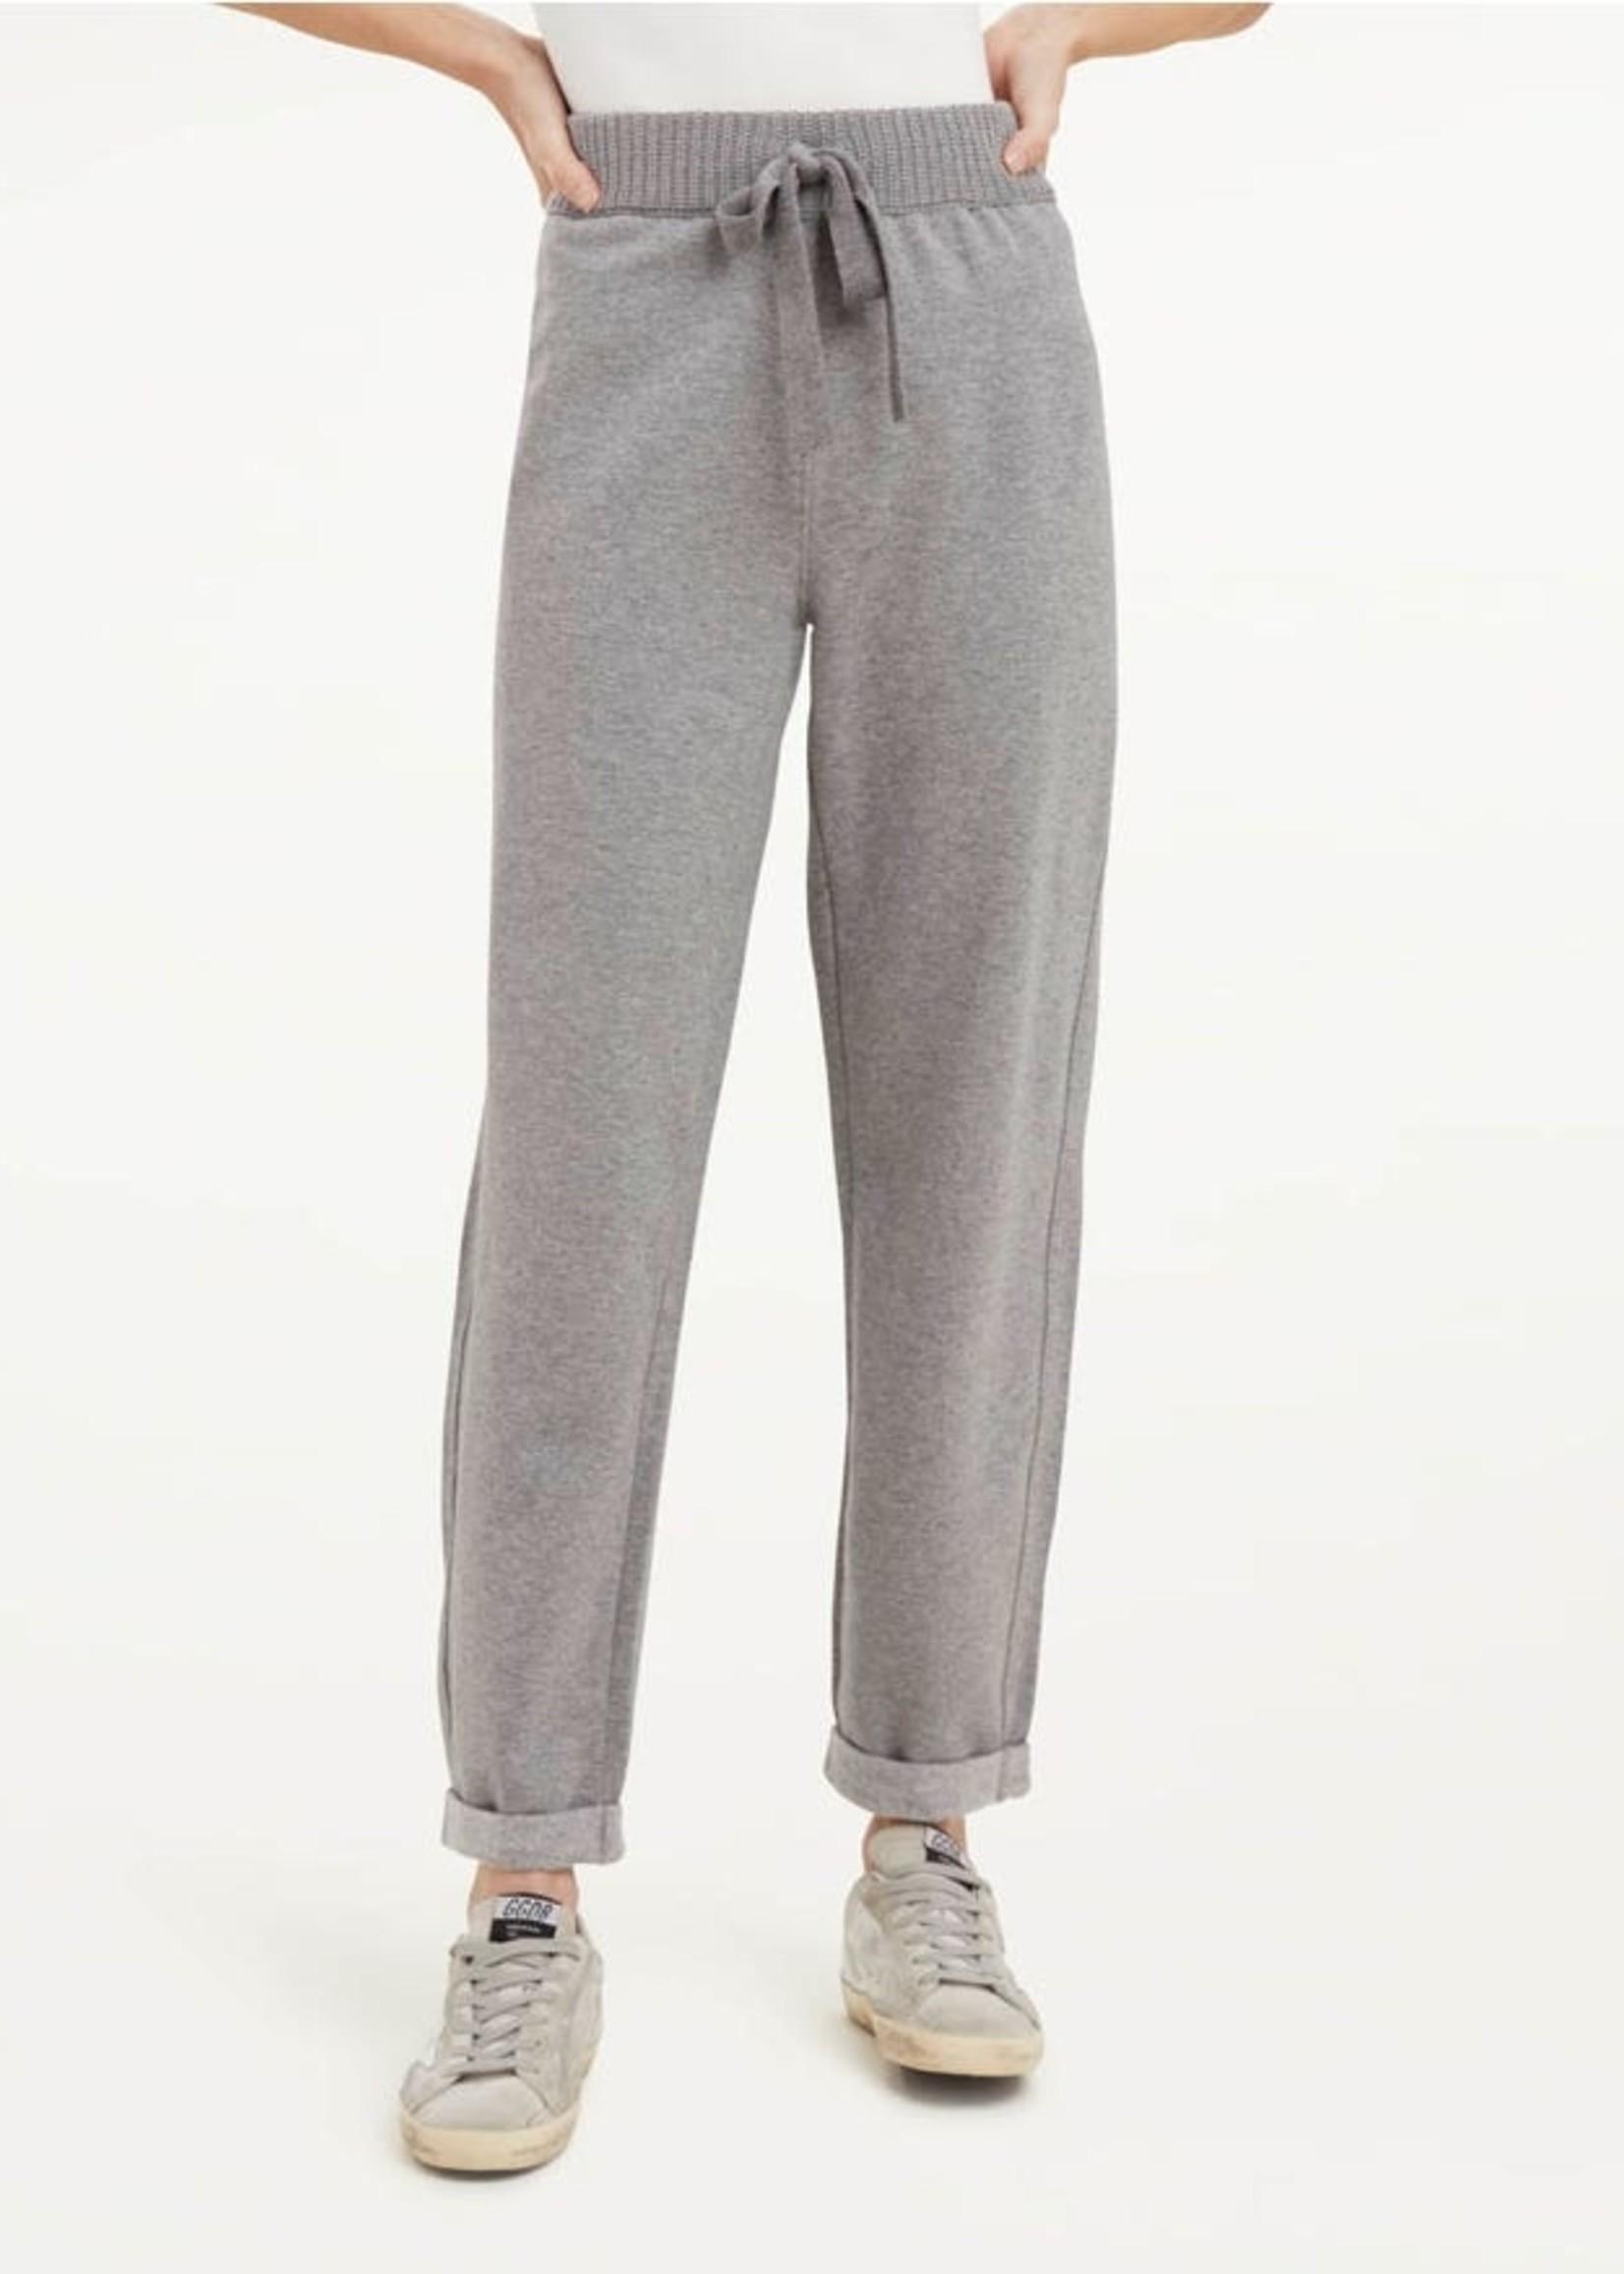 Splendid Shea Mix Sweater Pant